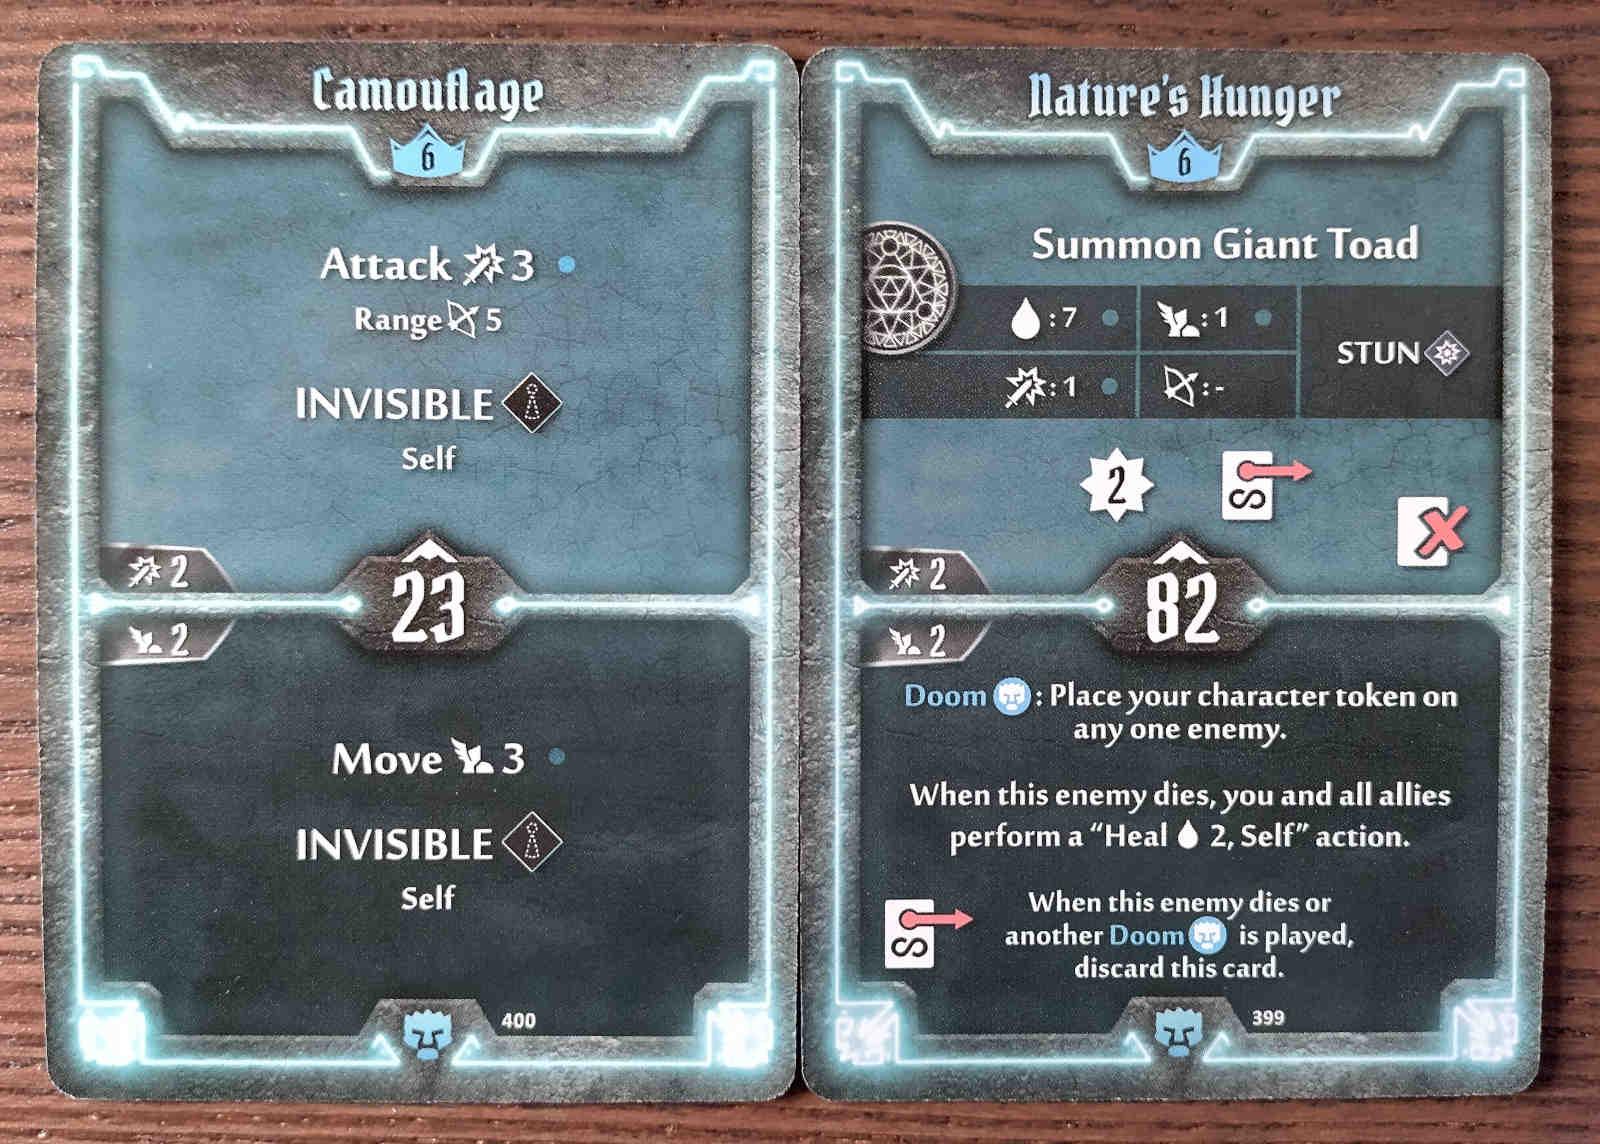 Level 6 Doomstalker cards - Camouflage and Nature's Hunger